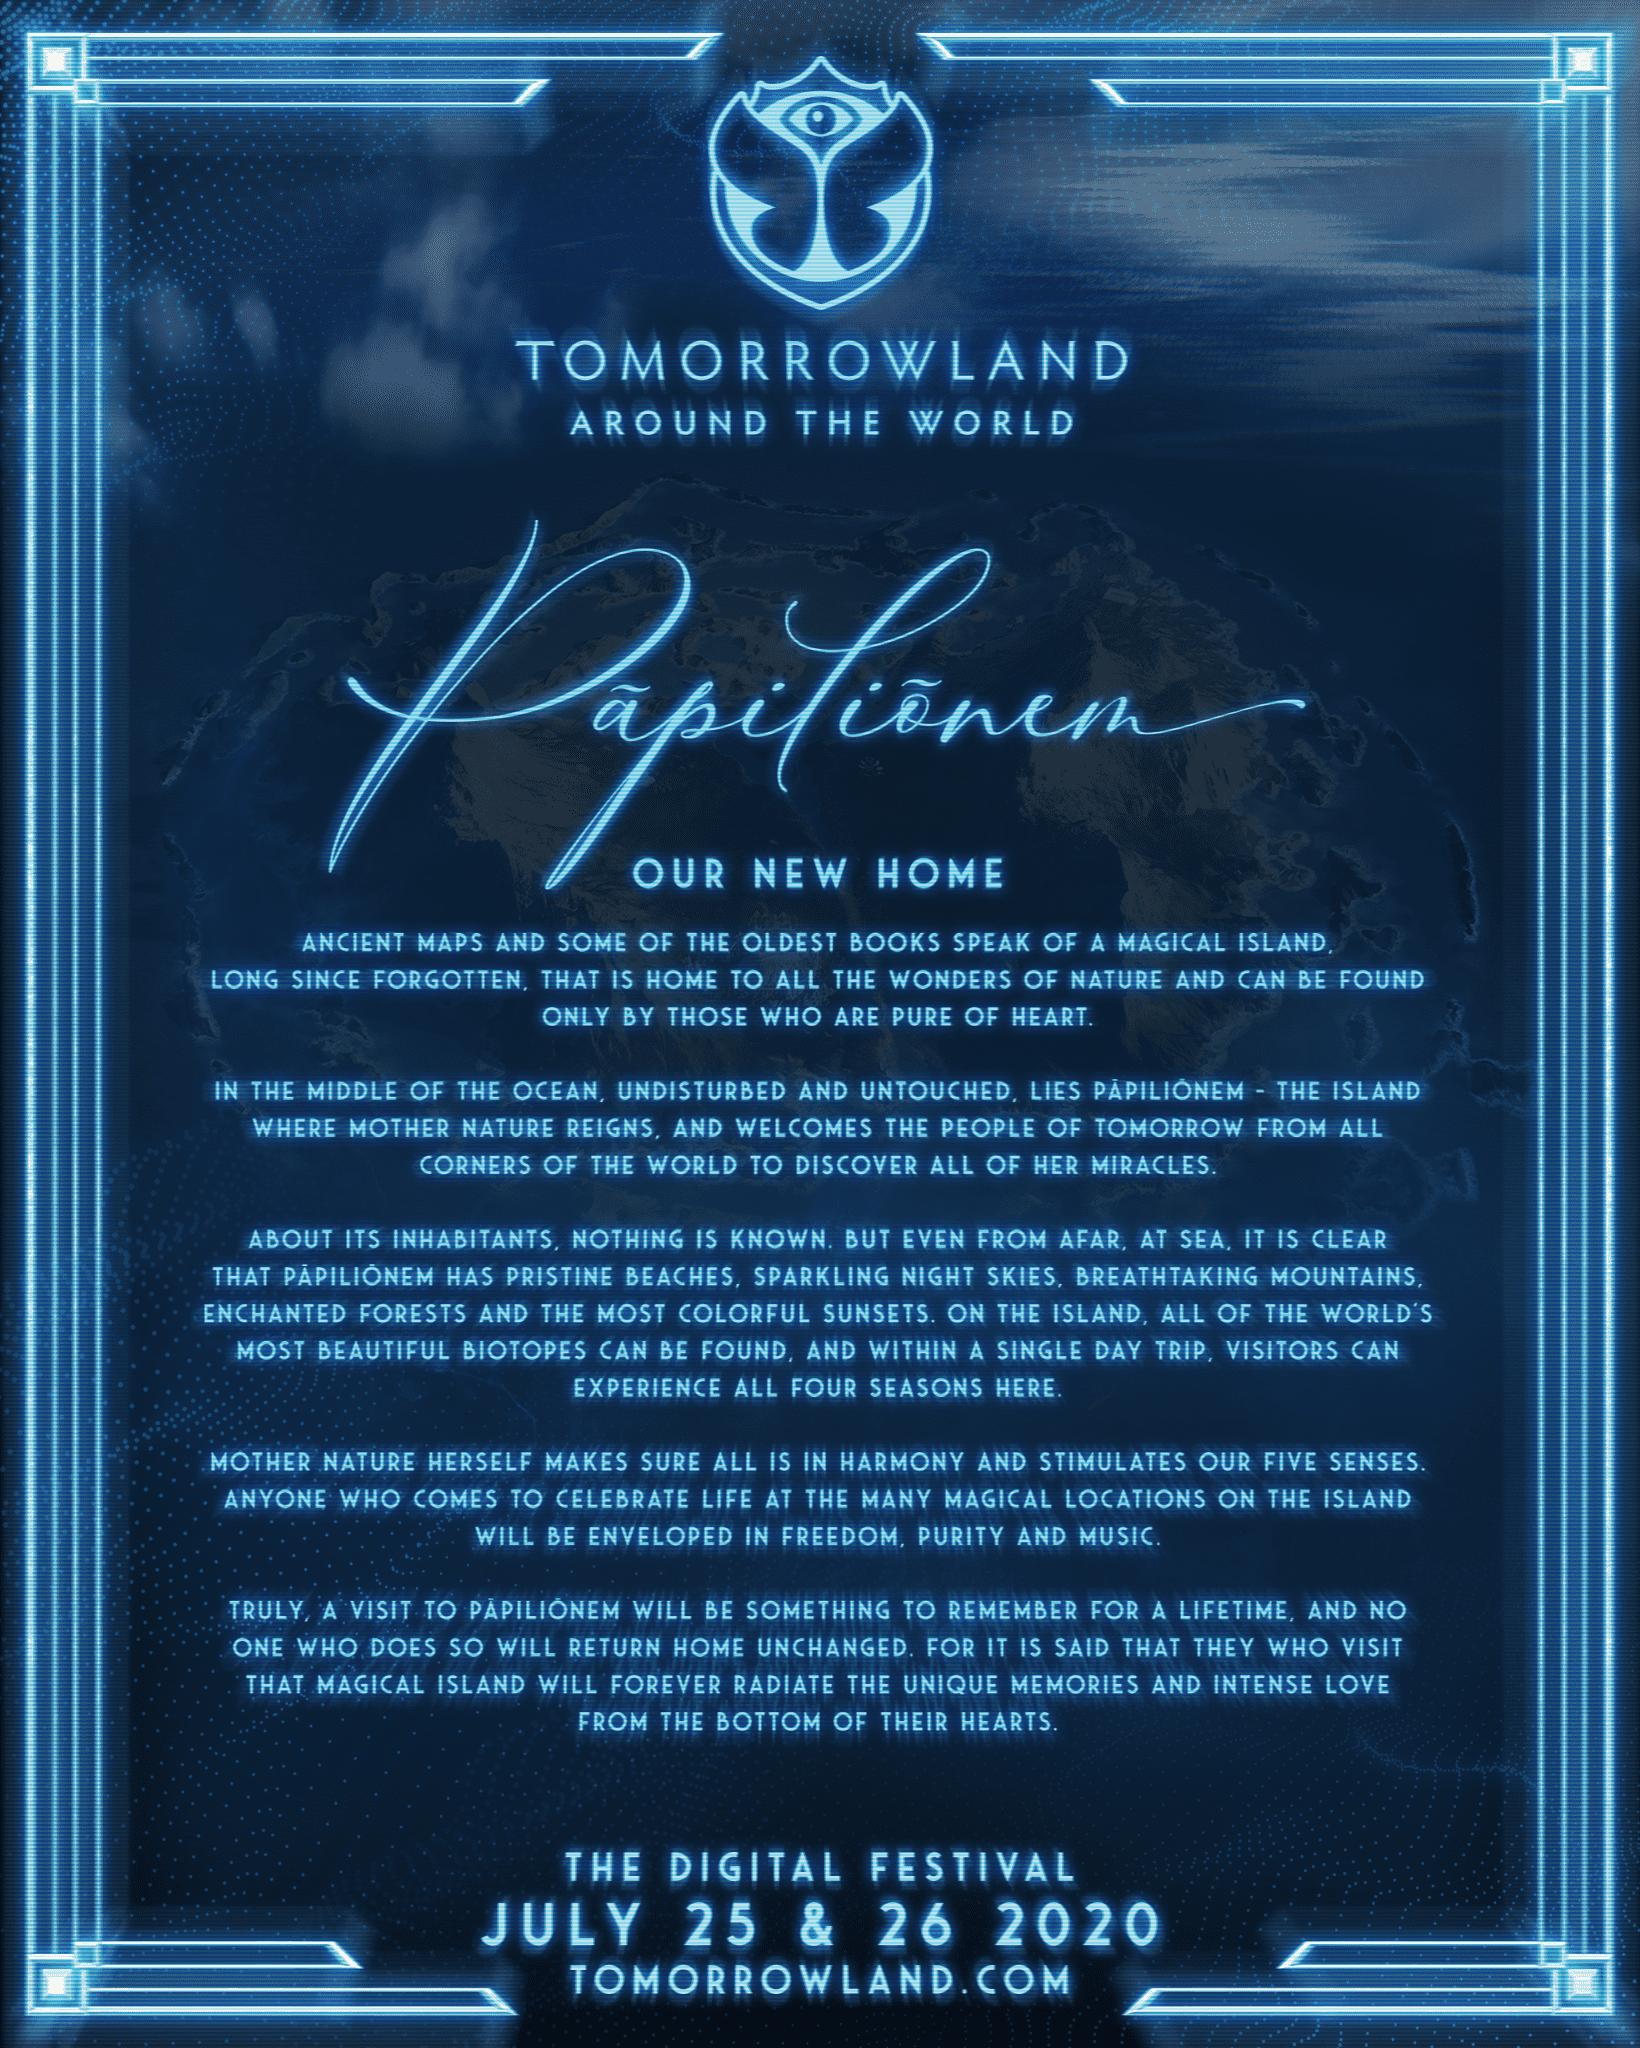 Tomorrowland Around the World - Pāpiliōnem - Announcement 2